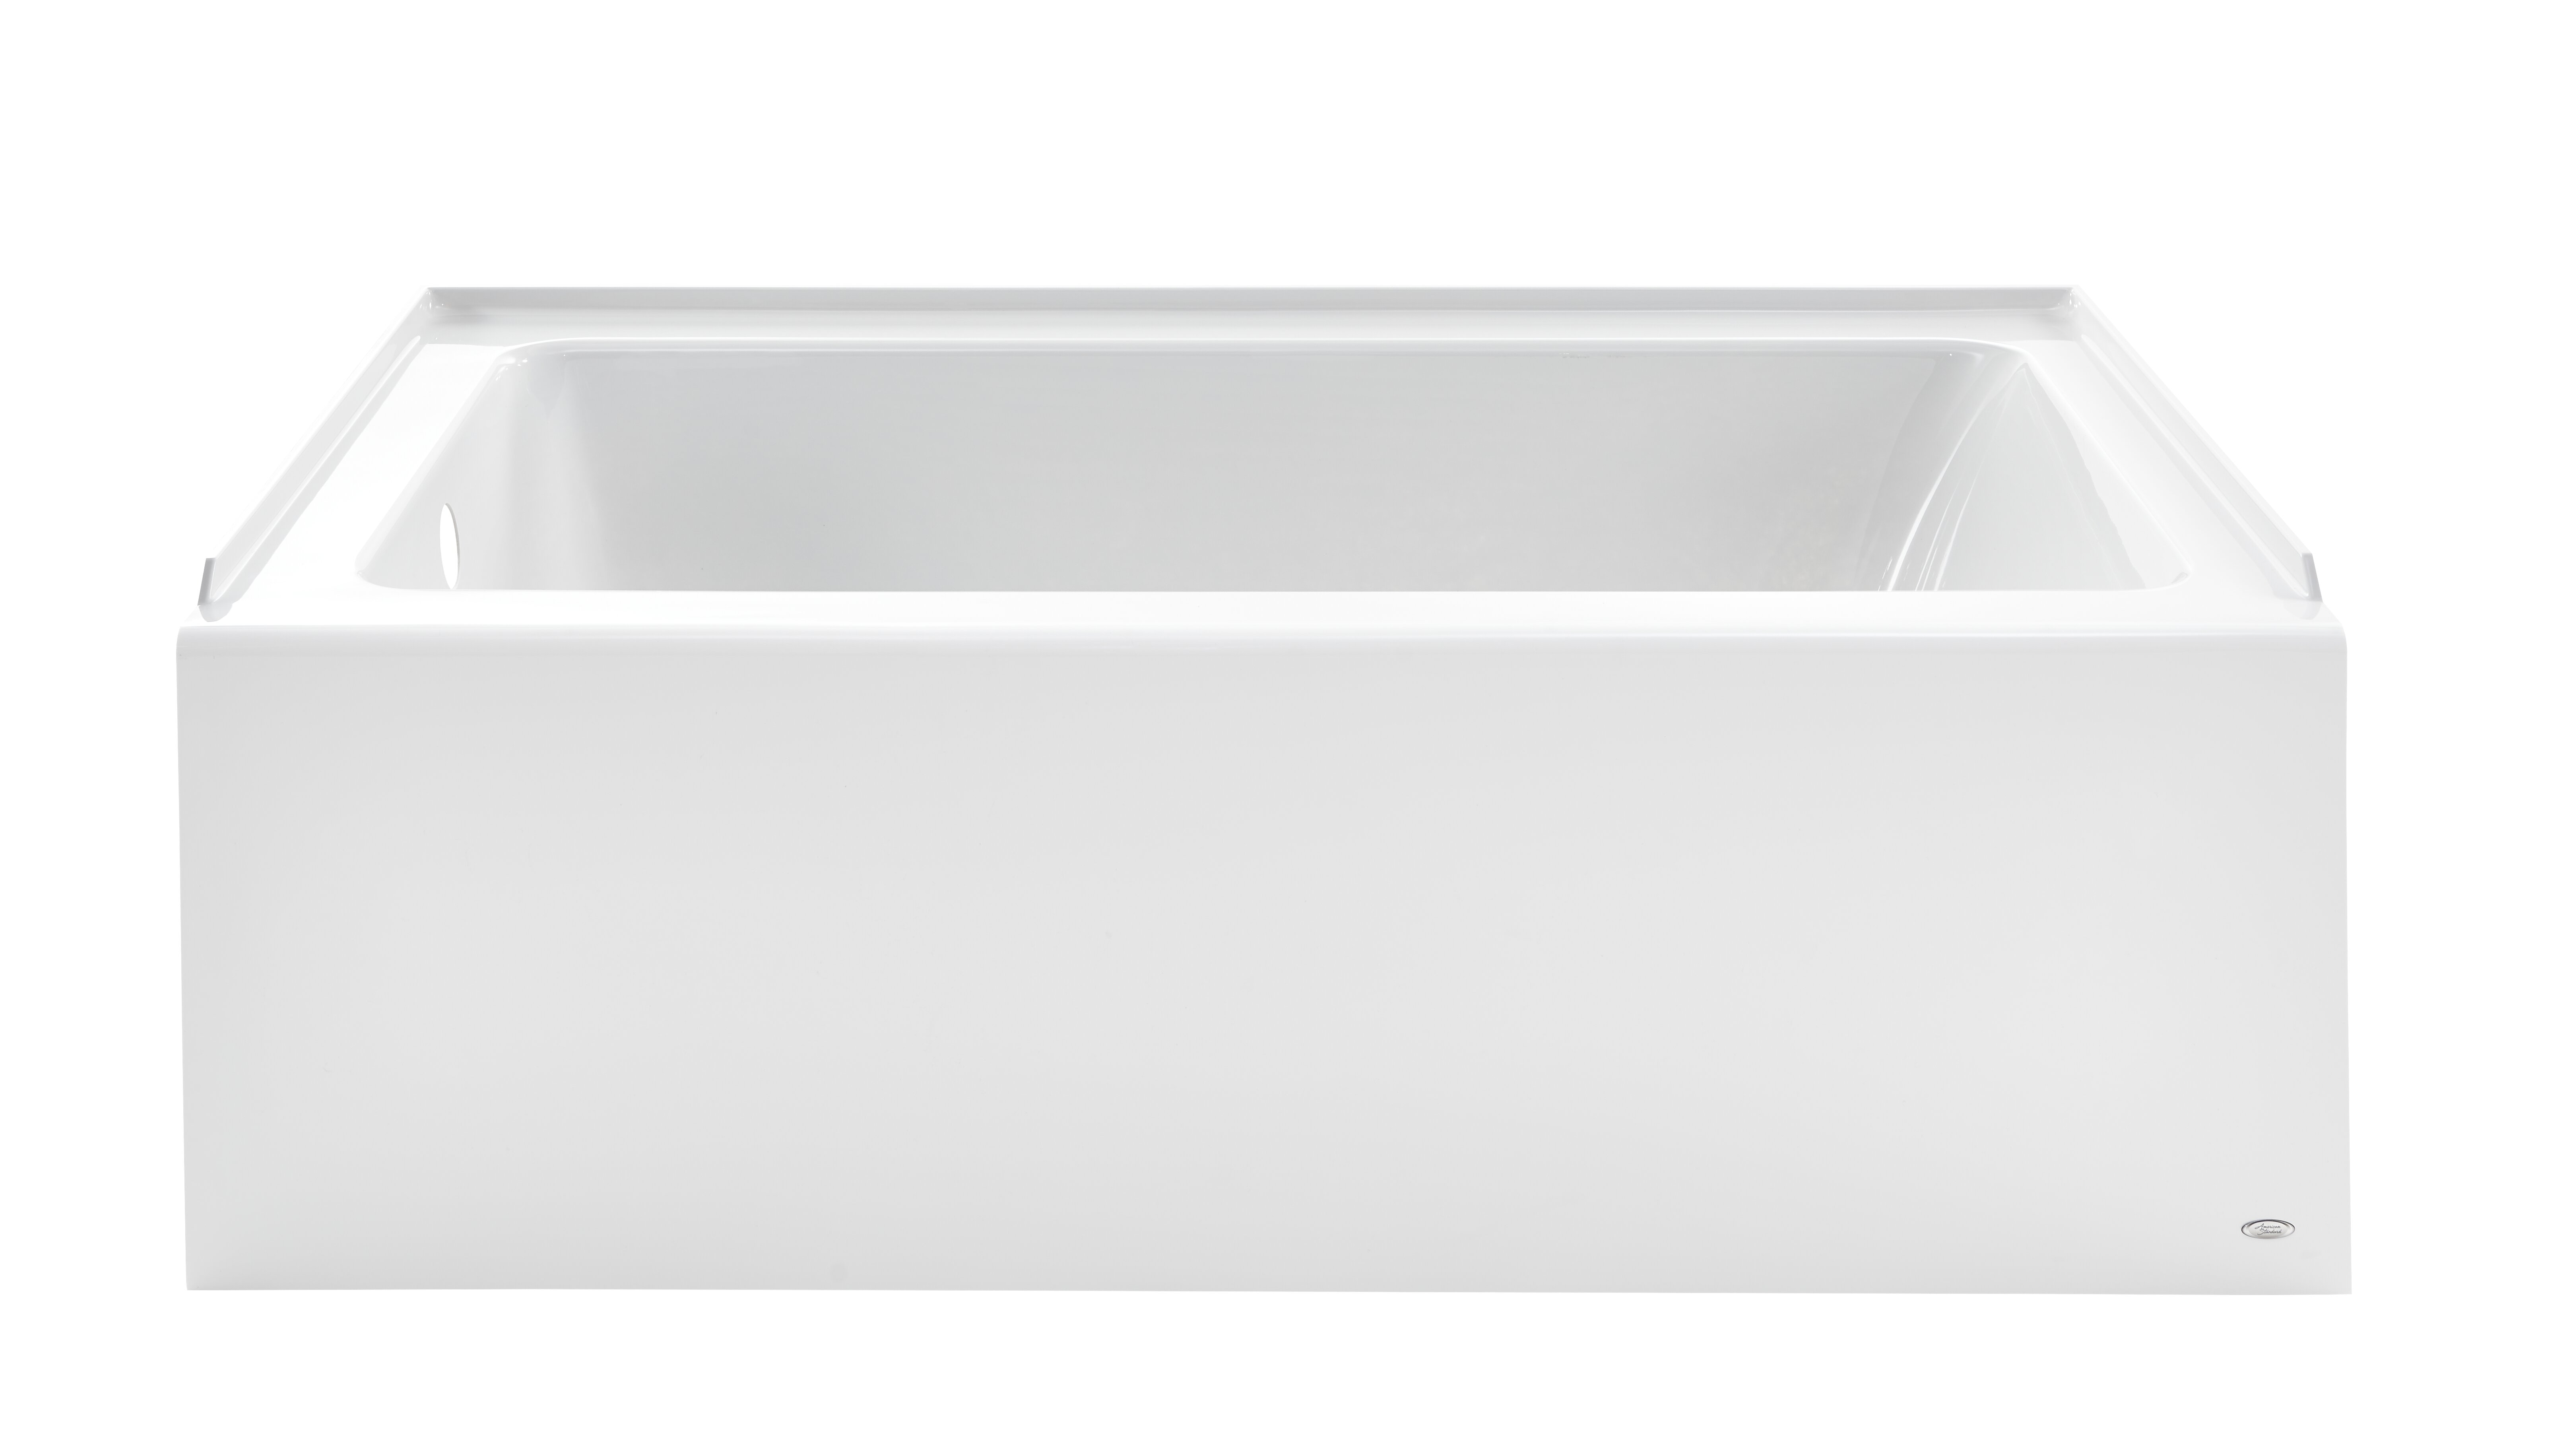 American Standard Studio Acrylic Tub 60 X 30 Alcove Soaking Bathtub Wayfair